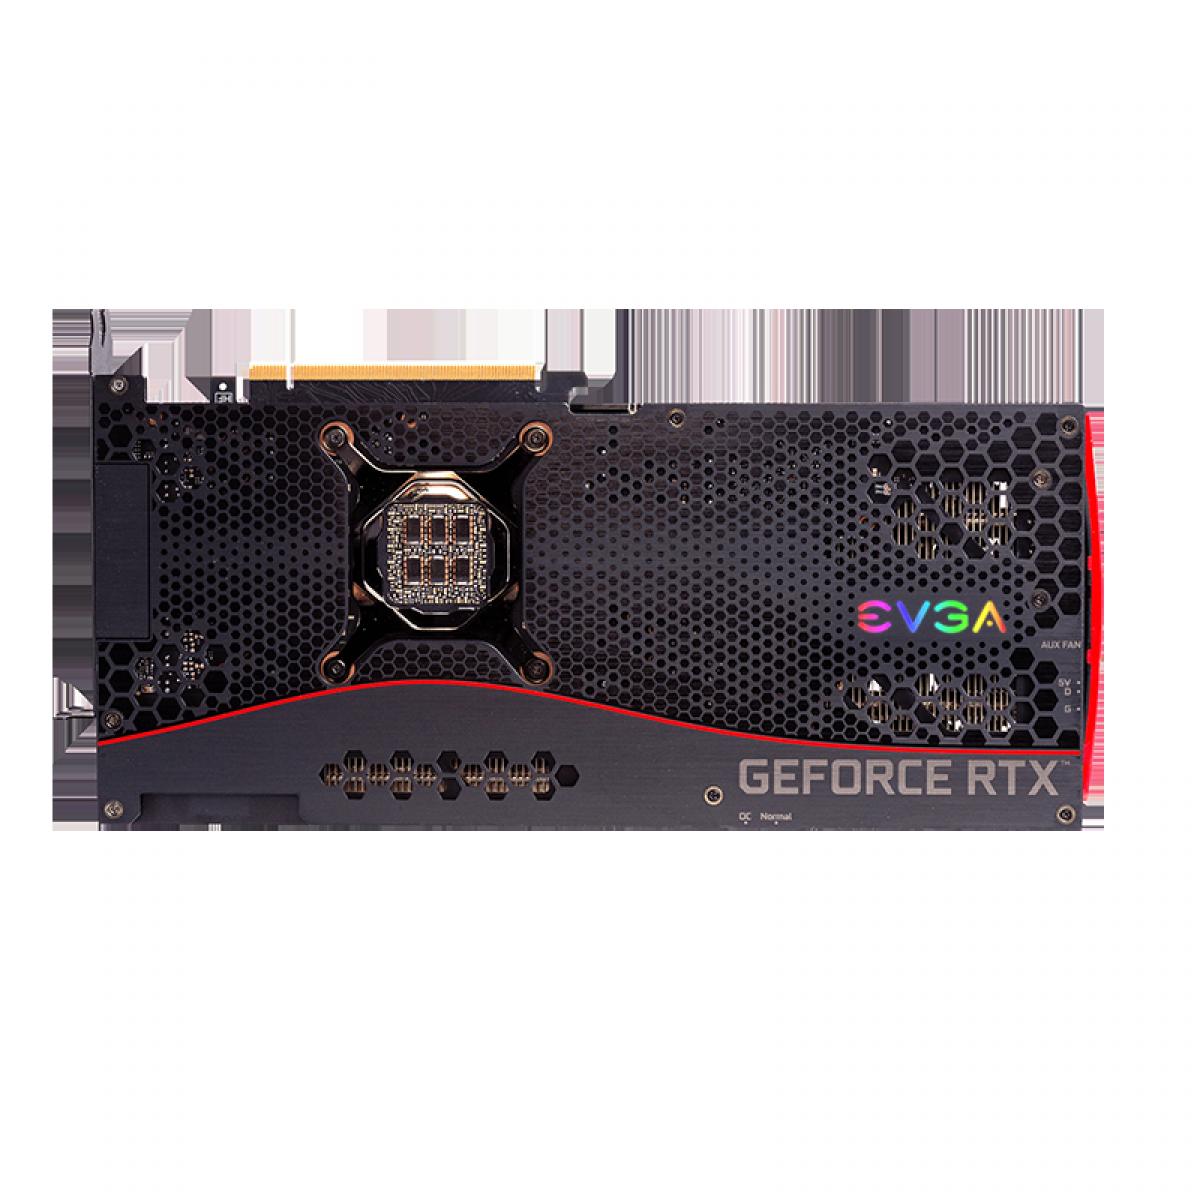 Placa de Vídeo EVGA FTW3 Ultra Gaming Geforce, RTX 3080, 10GB, GDDR6X, 320bit, 10G-P5-3897-KR